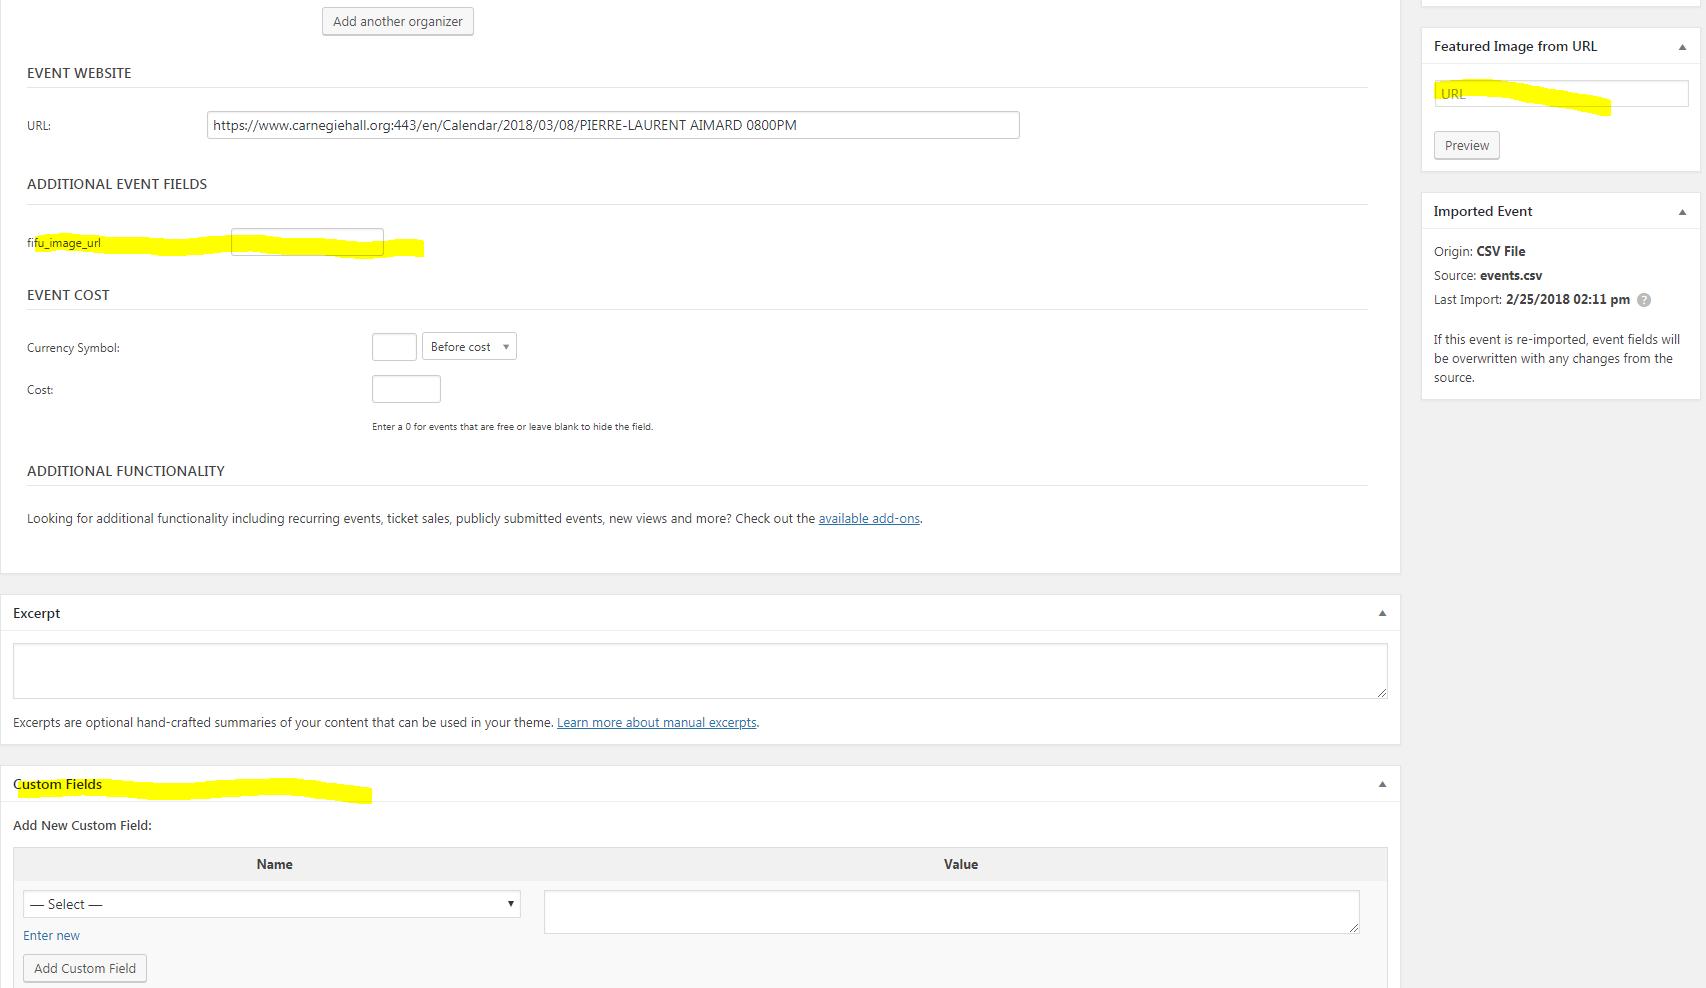 CSV importing fifu_image_url custom field for